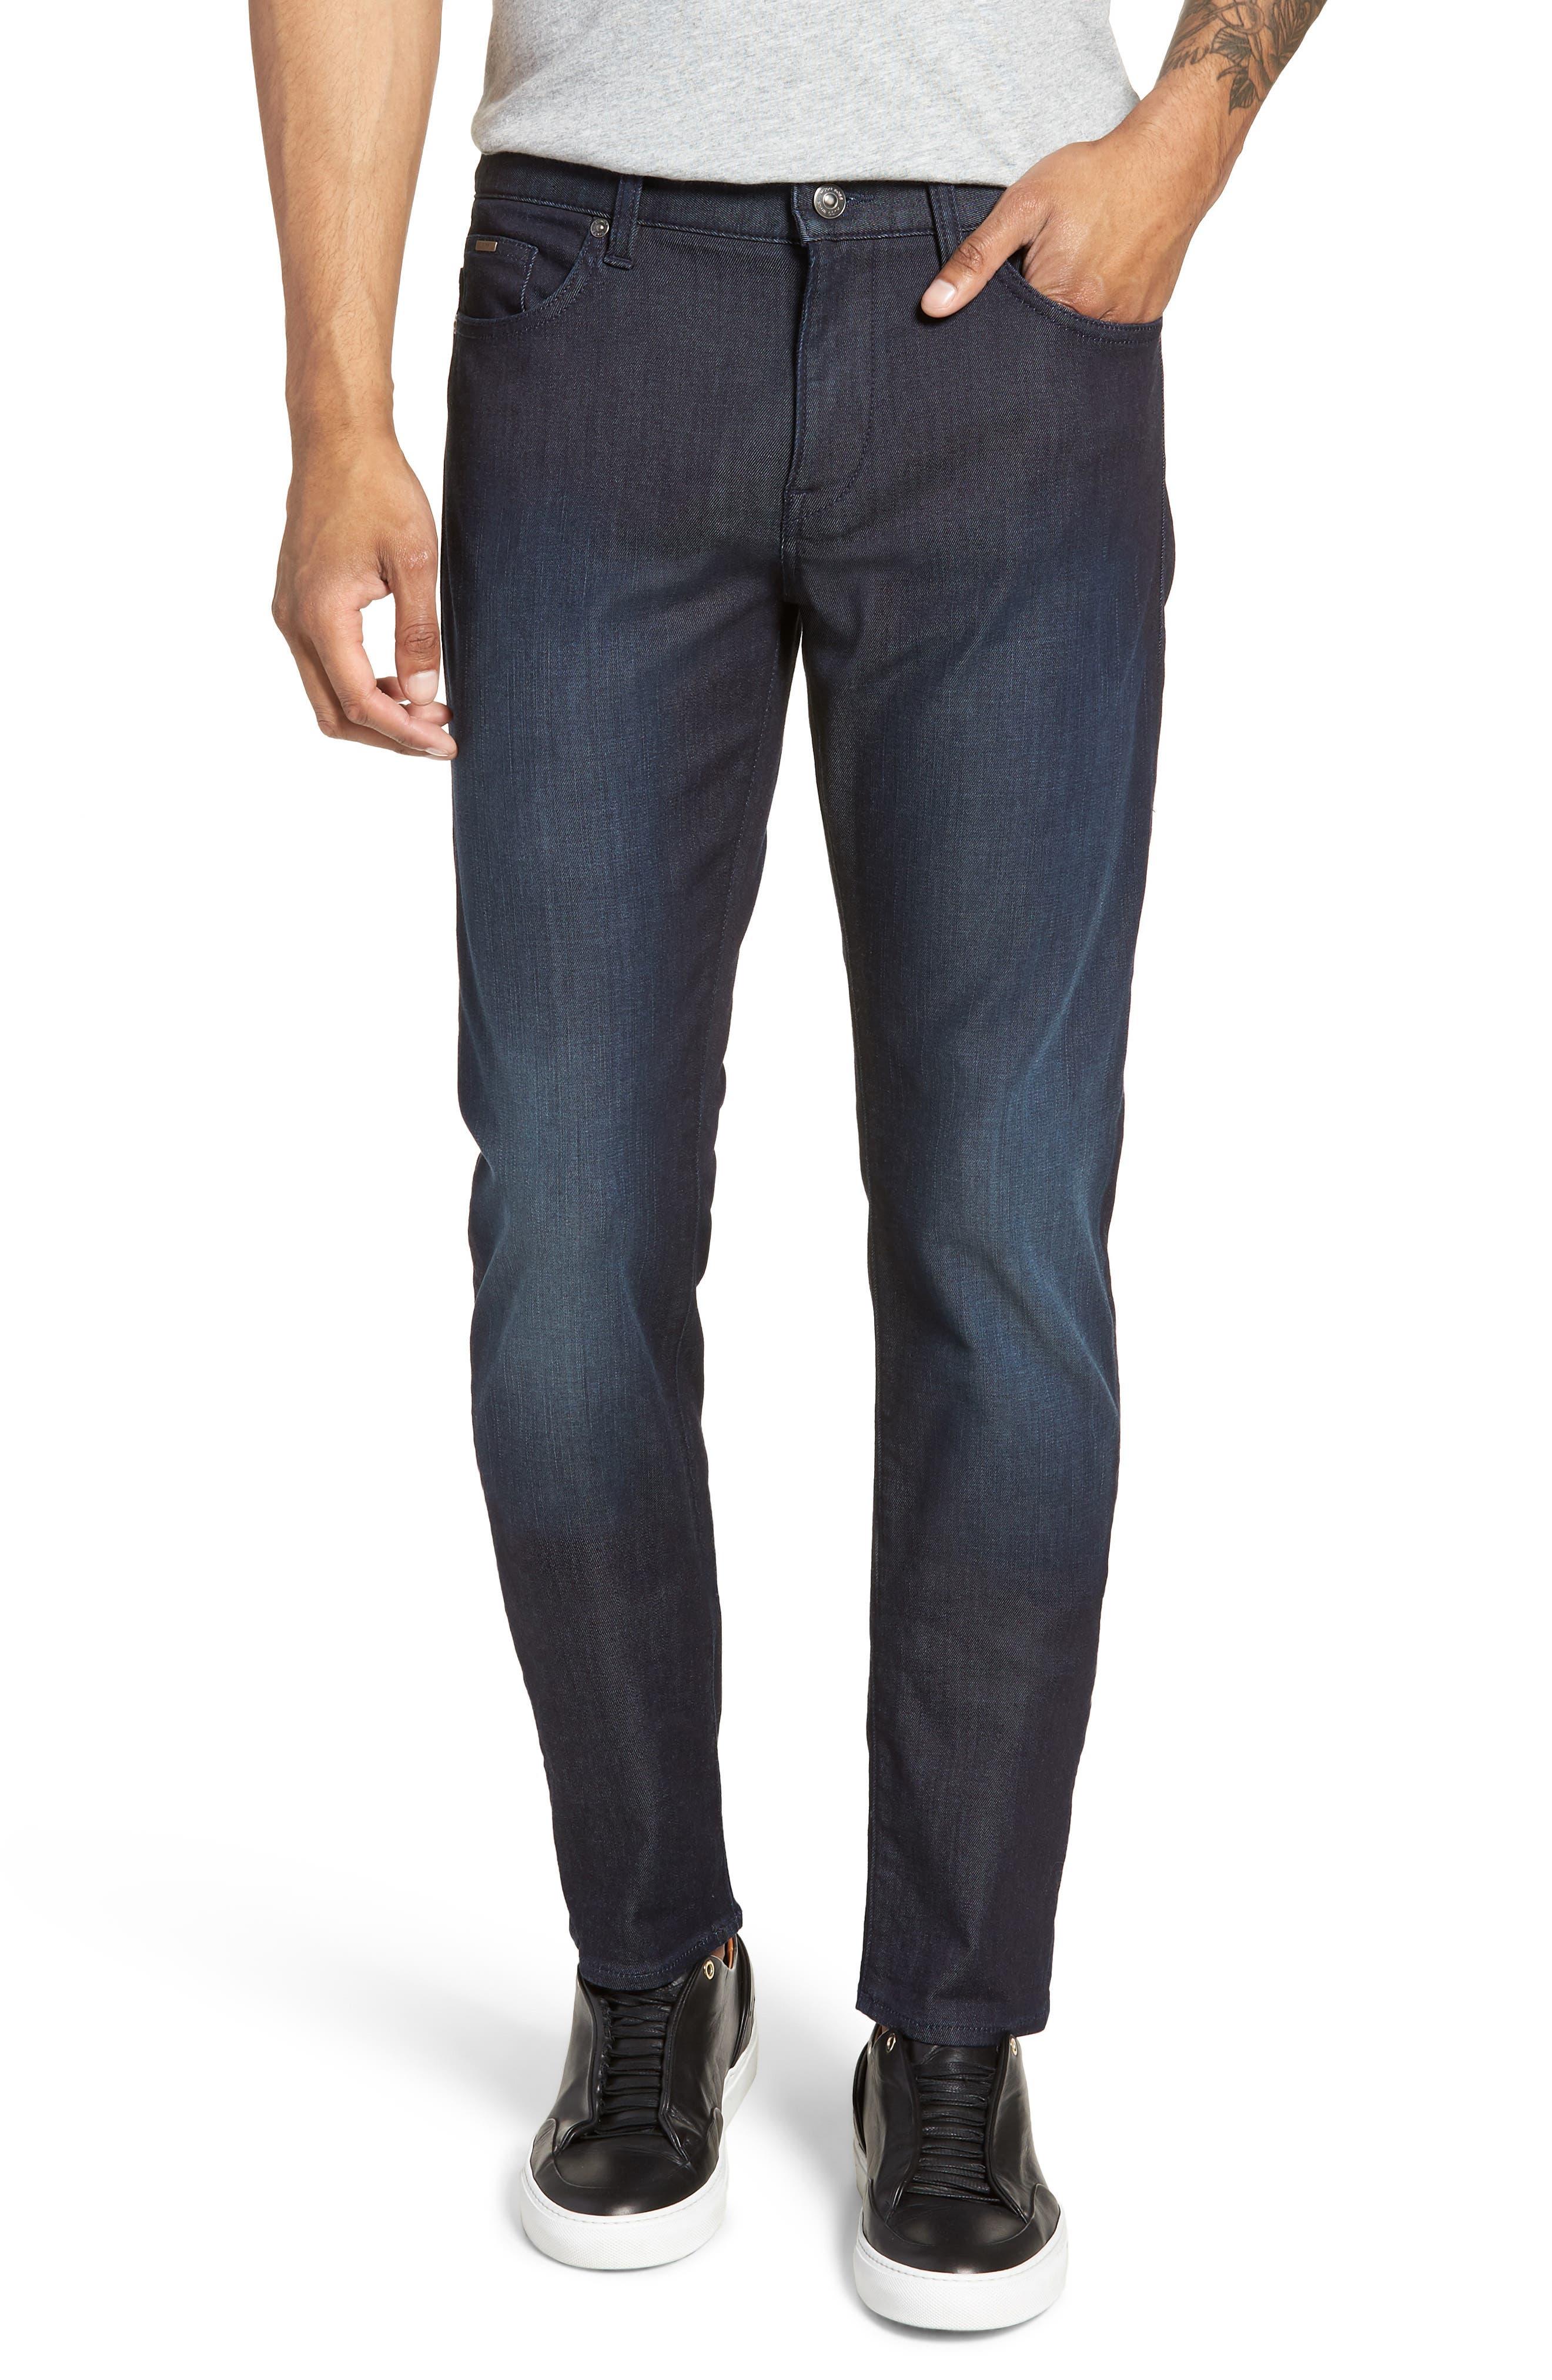 Delaware Slim Fit Jeans,                         Main,                         color,